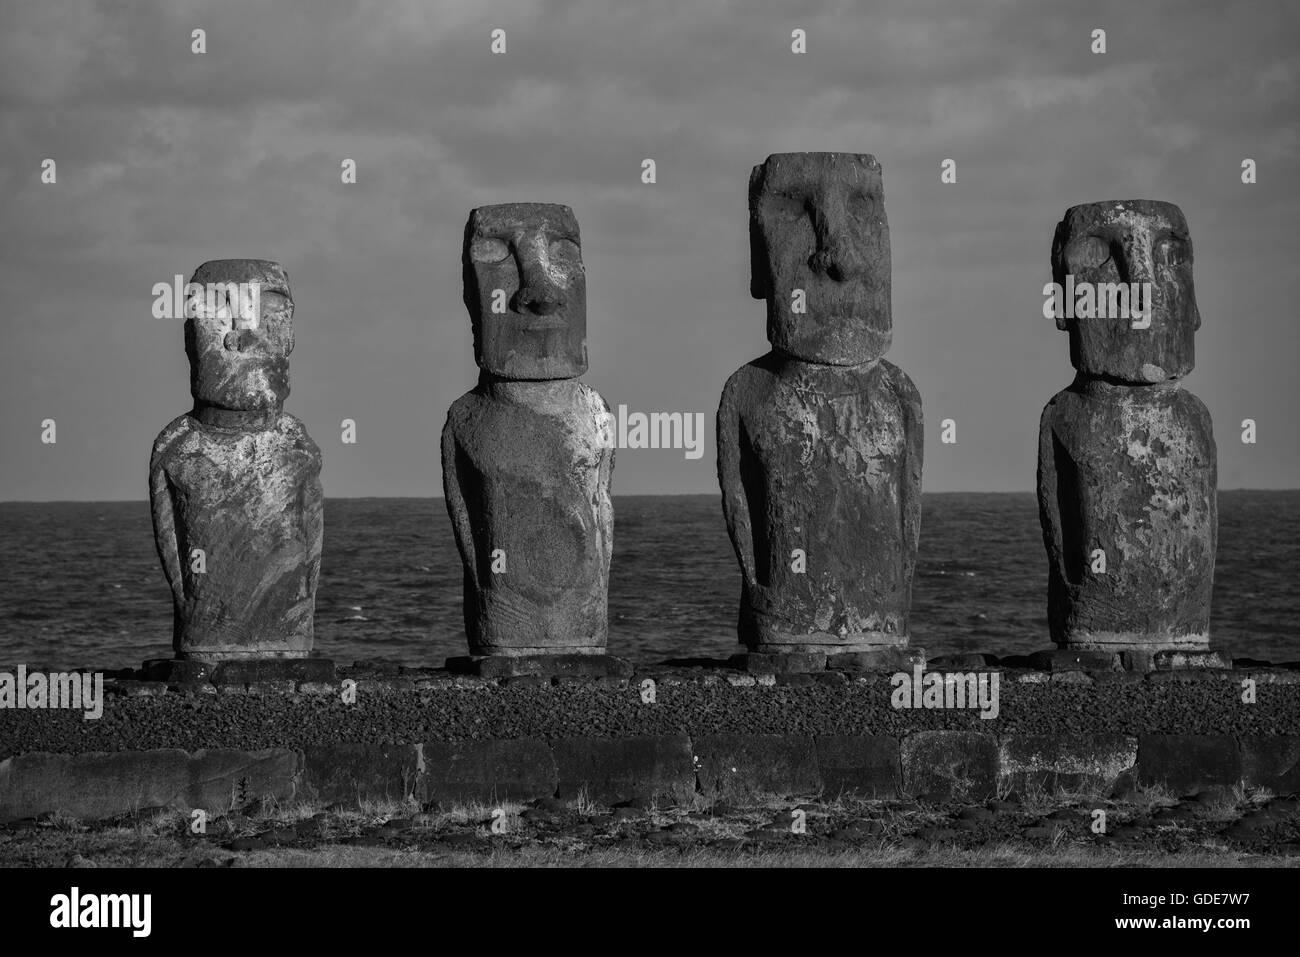 South America,Chile,Easter Island,Isla de Pasqua,south pacific,UNESCO,World Heritage, - Stock Image